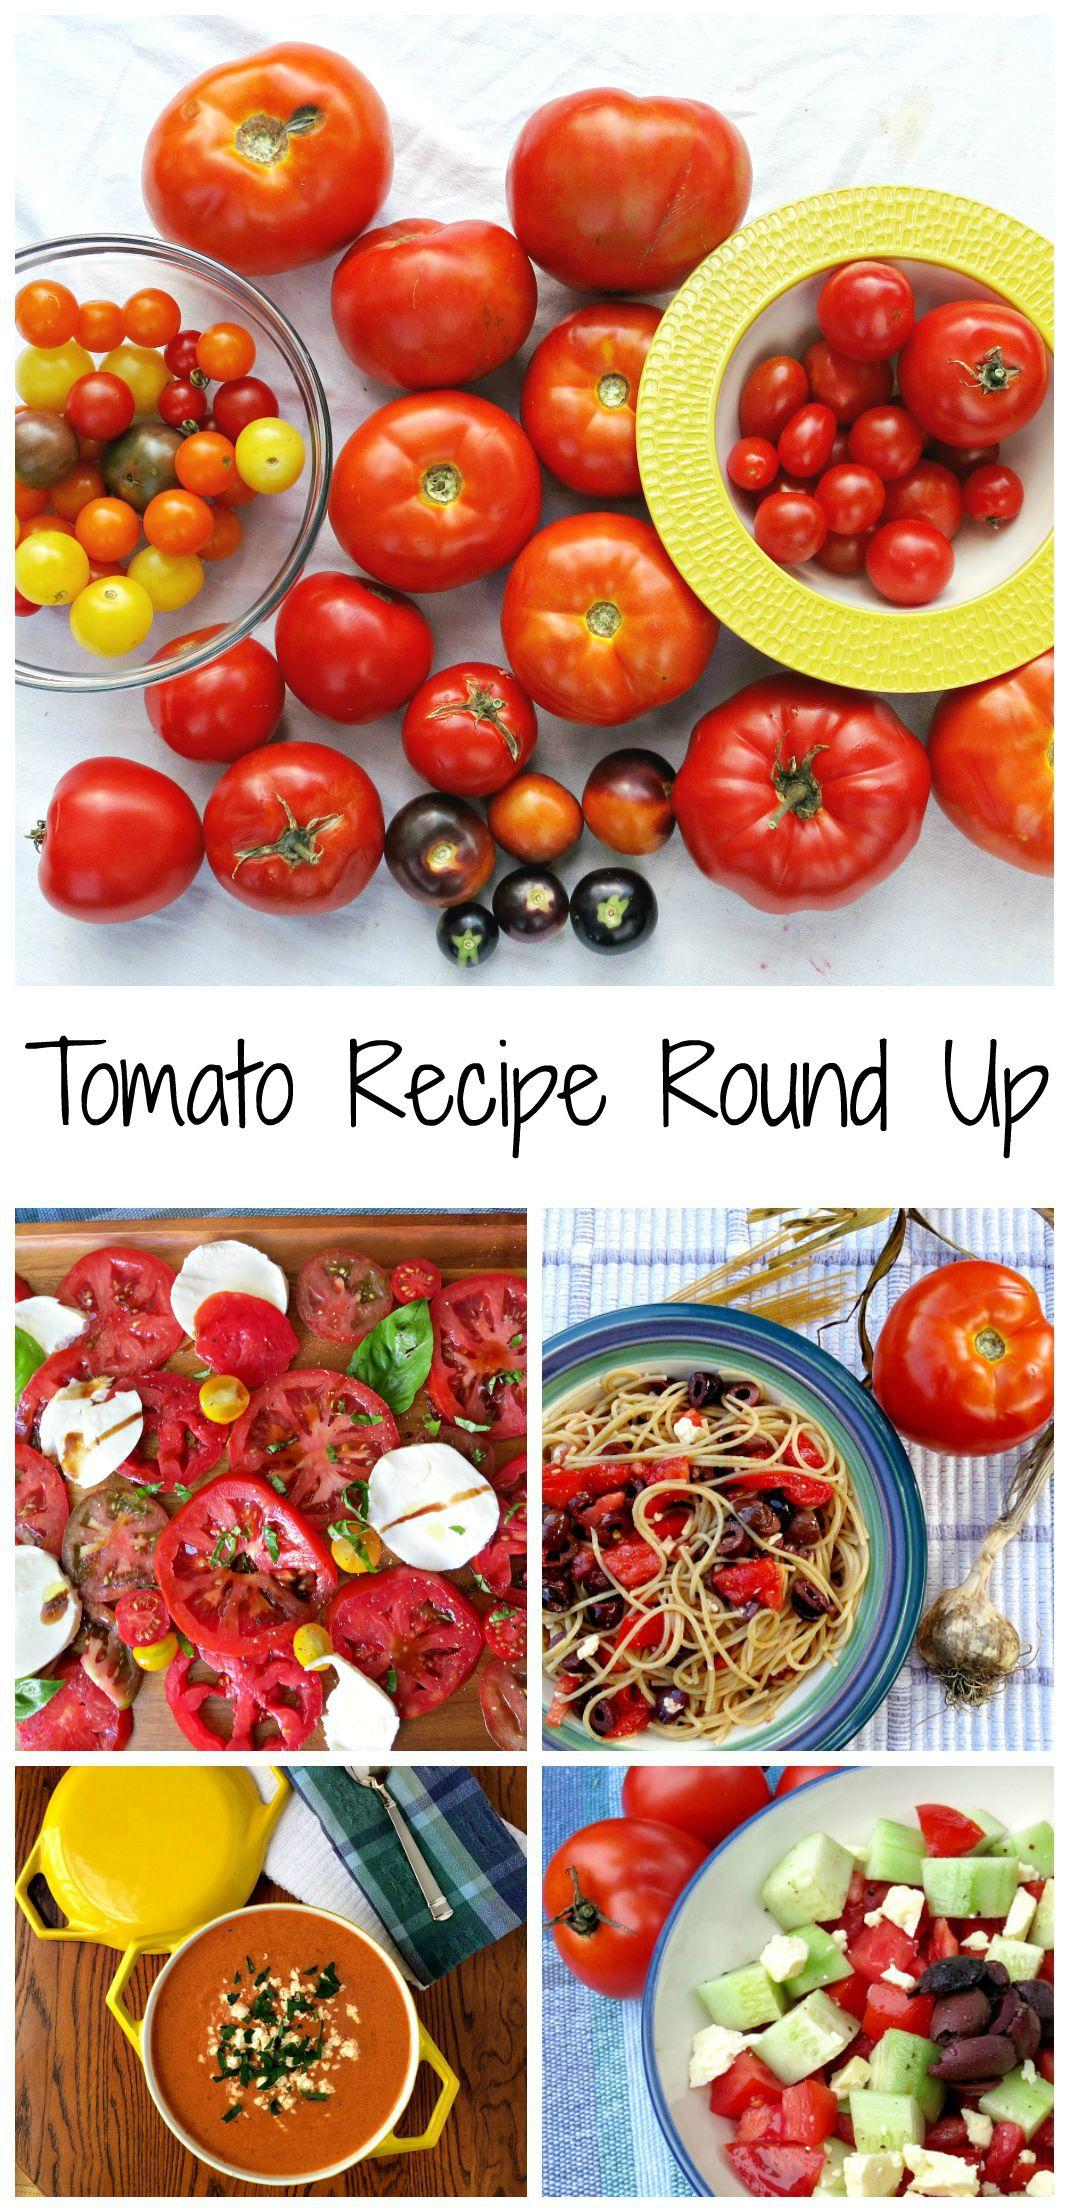 Tomato Recipe Round Up